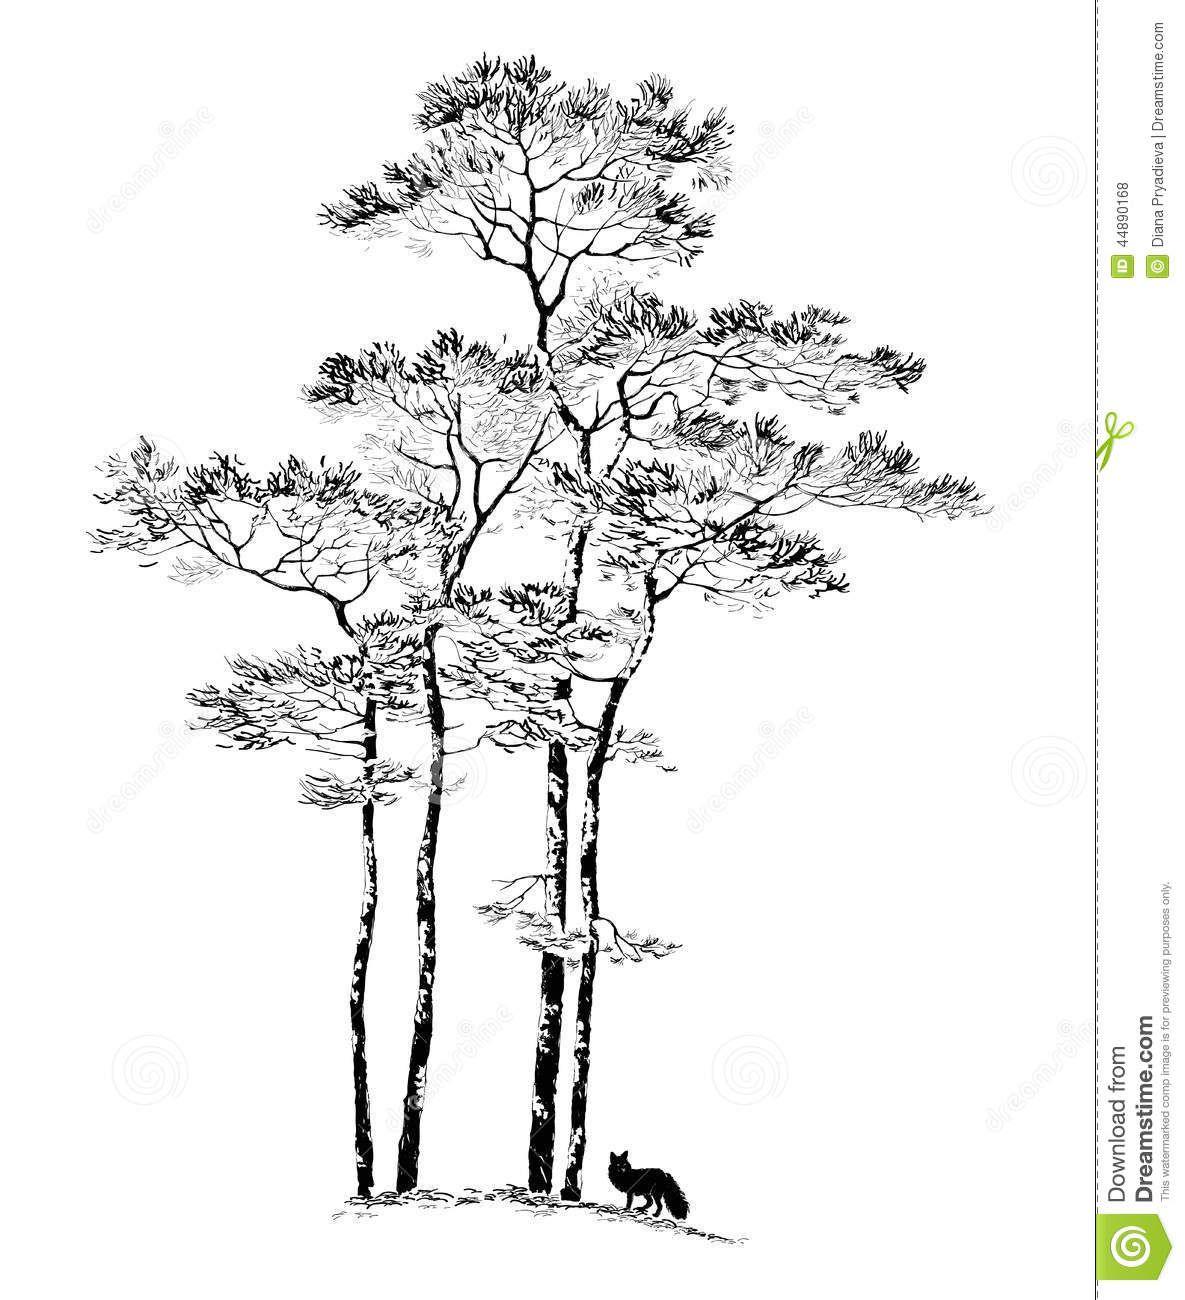 Uncategorized Pine Tree Sketch ponderosa pine tree drawing google search tenacious tentacles search